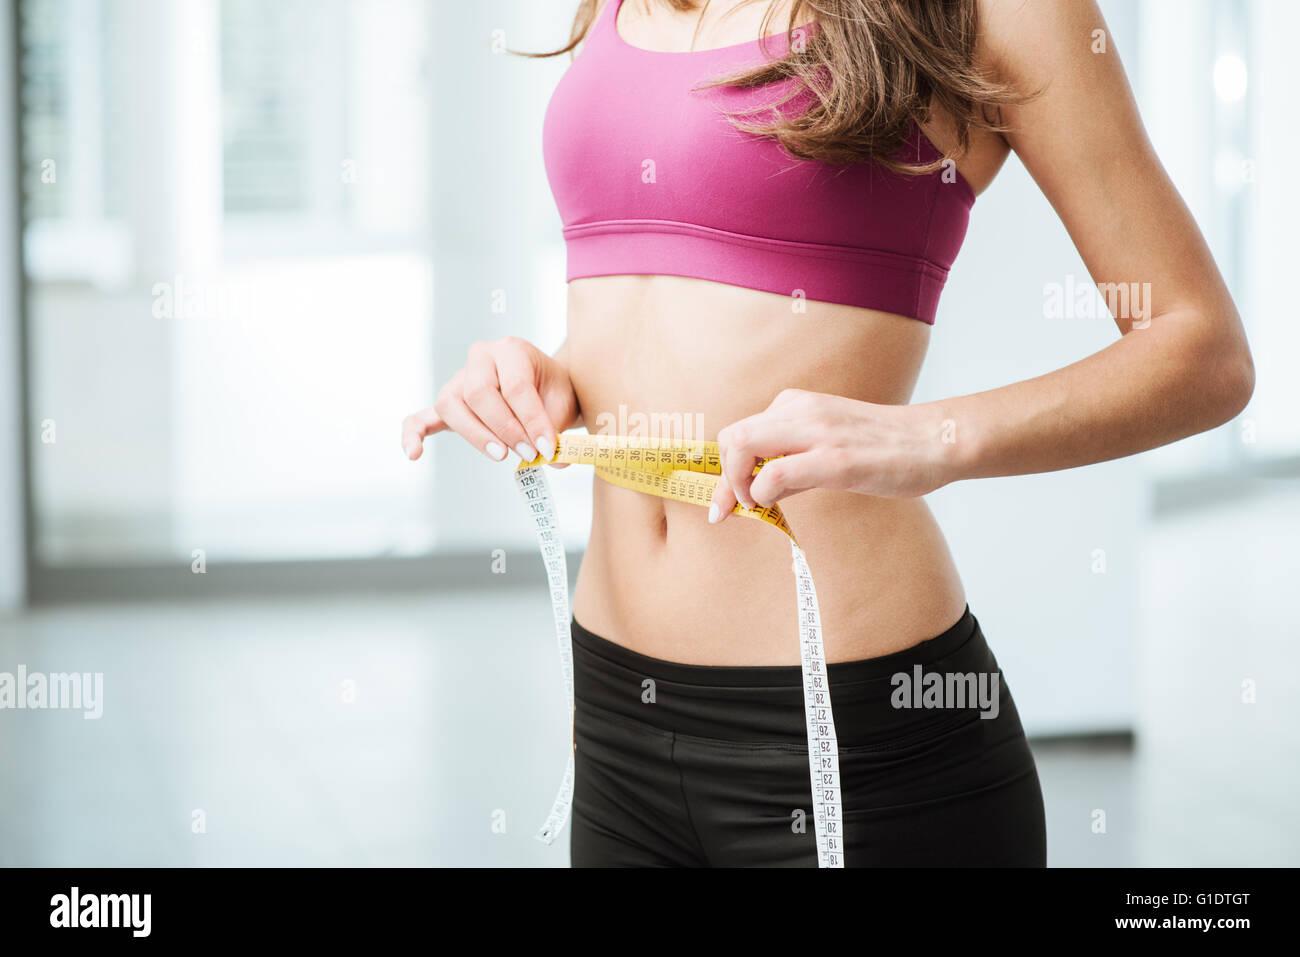 Jeune femme Slim mesurer sa taille mince avec un ruban à mesurer, Close up Photo Stock